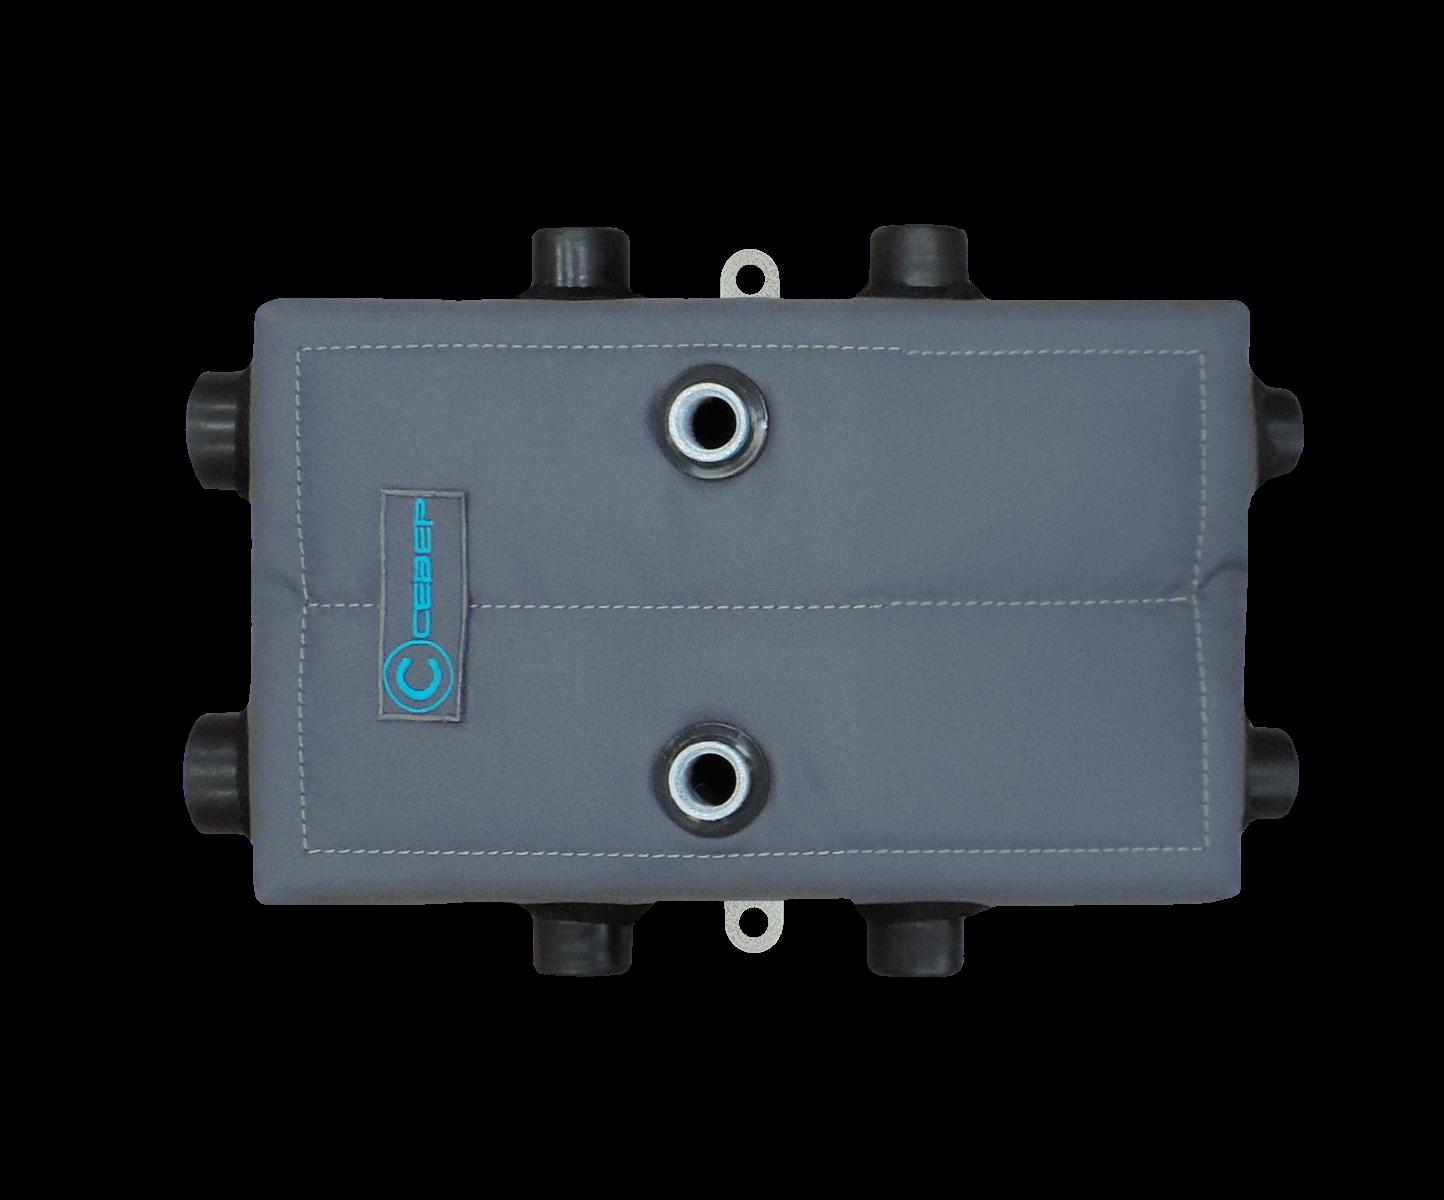 Теплоизоляция, теплоизоляционный чехол для гидрообвязки Север КМ3